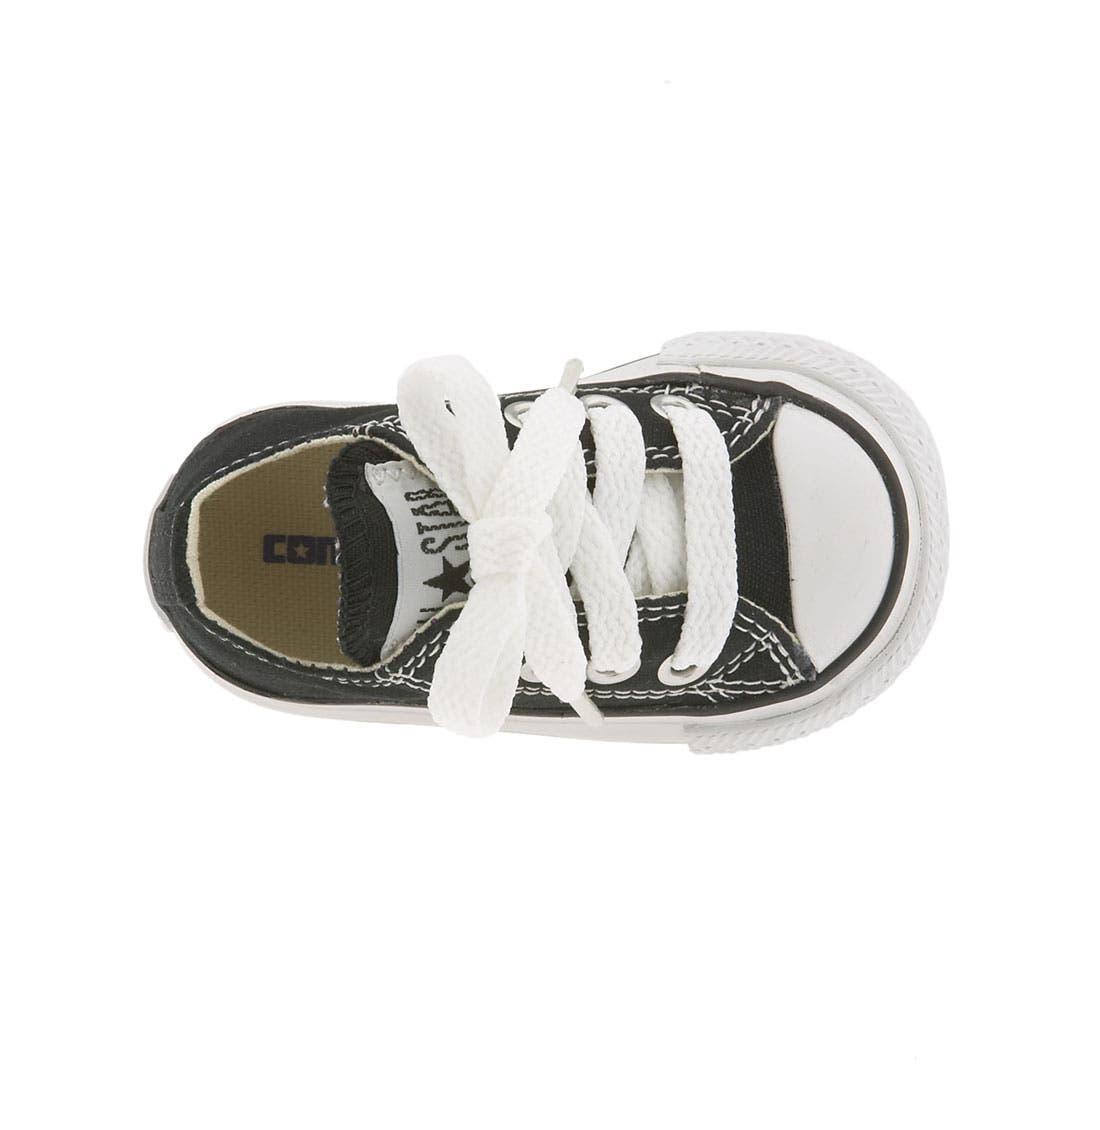 CONVERSE,                             Chuck Taylor<sup>®</sup> Low Top Sneaker,                             Alternate thumbnail 6, color,                             BLACK